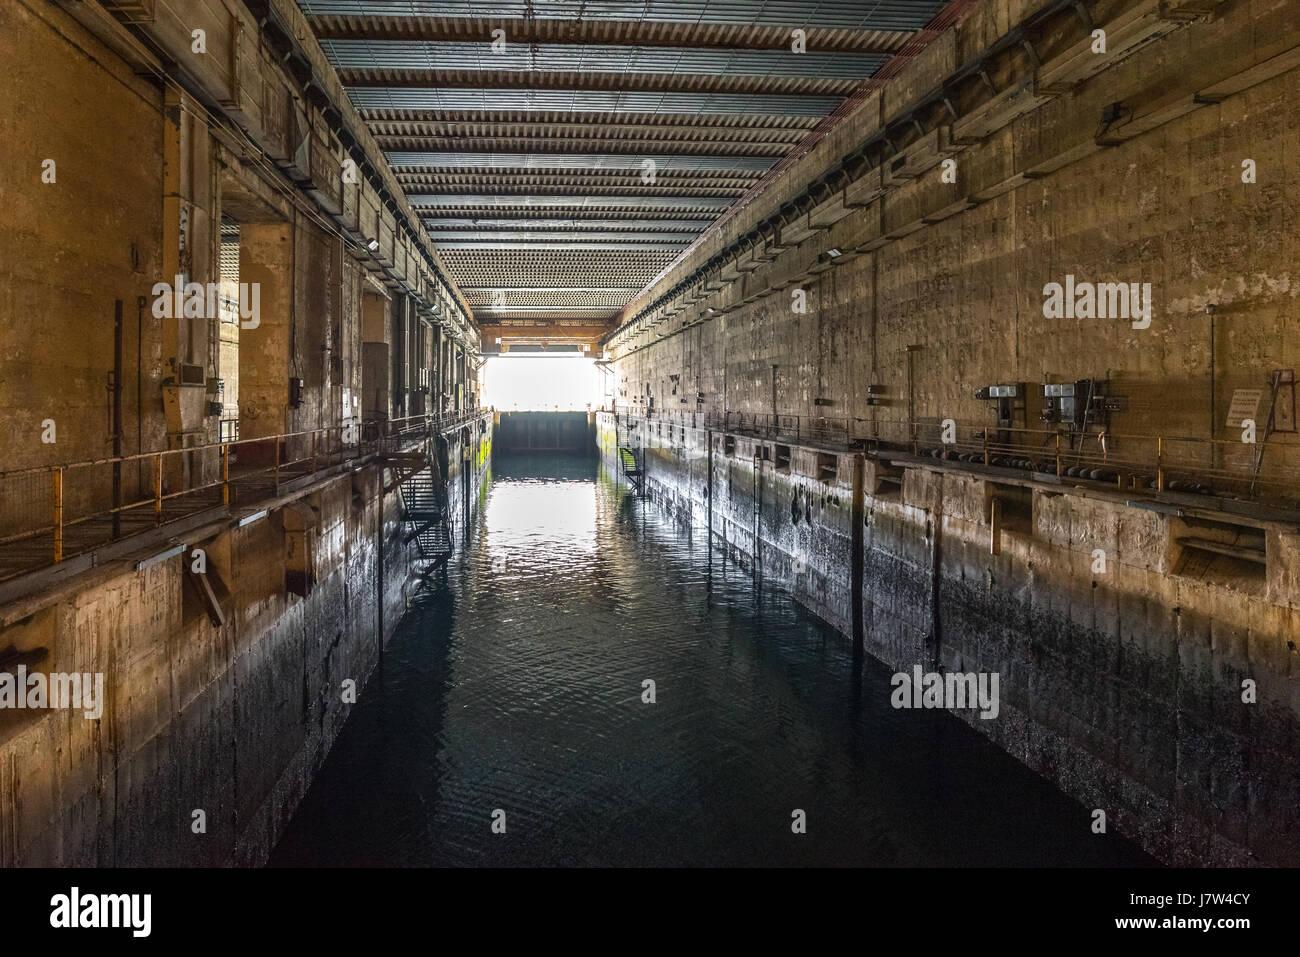 hight resolution of second world war u boat pen in keroman iii bunker lorient submarine base